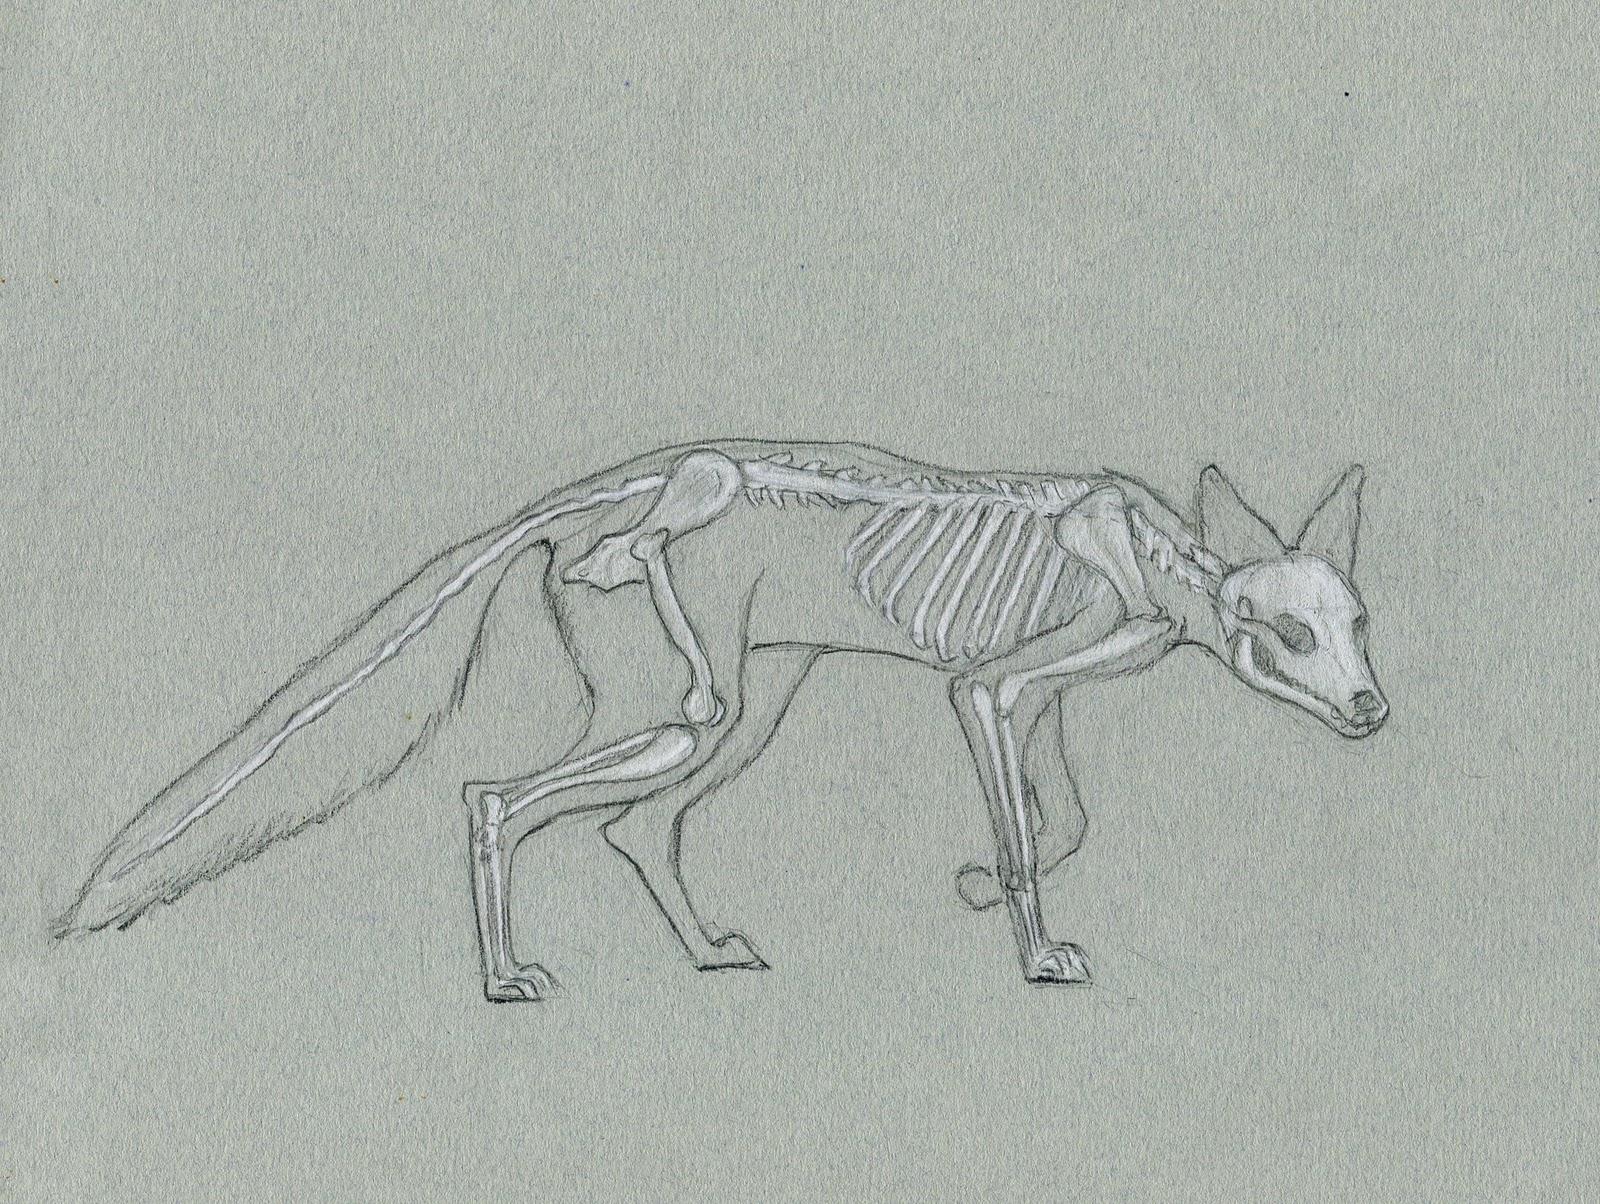 Alexis Demetriades Science Illustration: Quick Skeleton